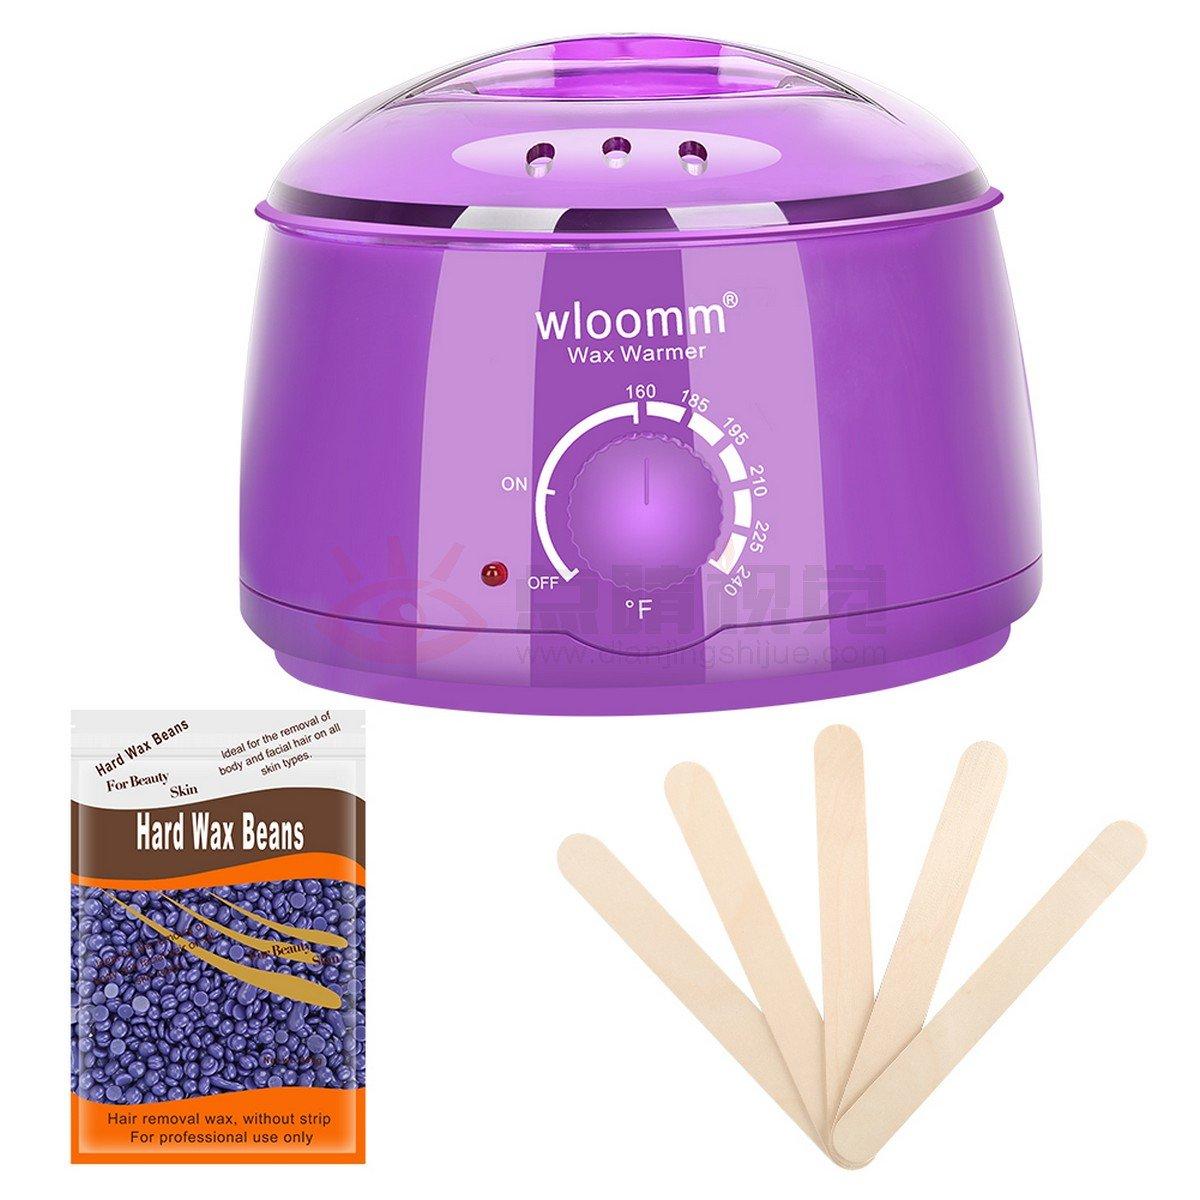 Wax Warmer Kit Wloomm 14oz Electric Hot Wax Warmer Hair Removal with 300g Hard Wax Beans and 5pcs Wax Applicator Sticks for Men & Women (Purple)